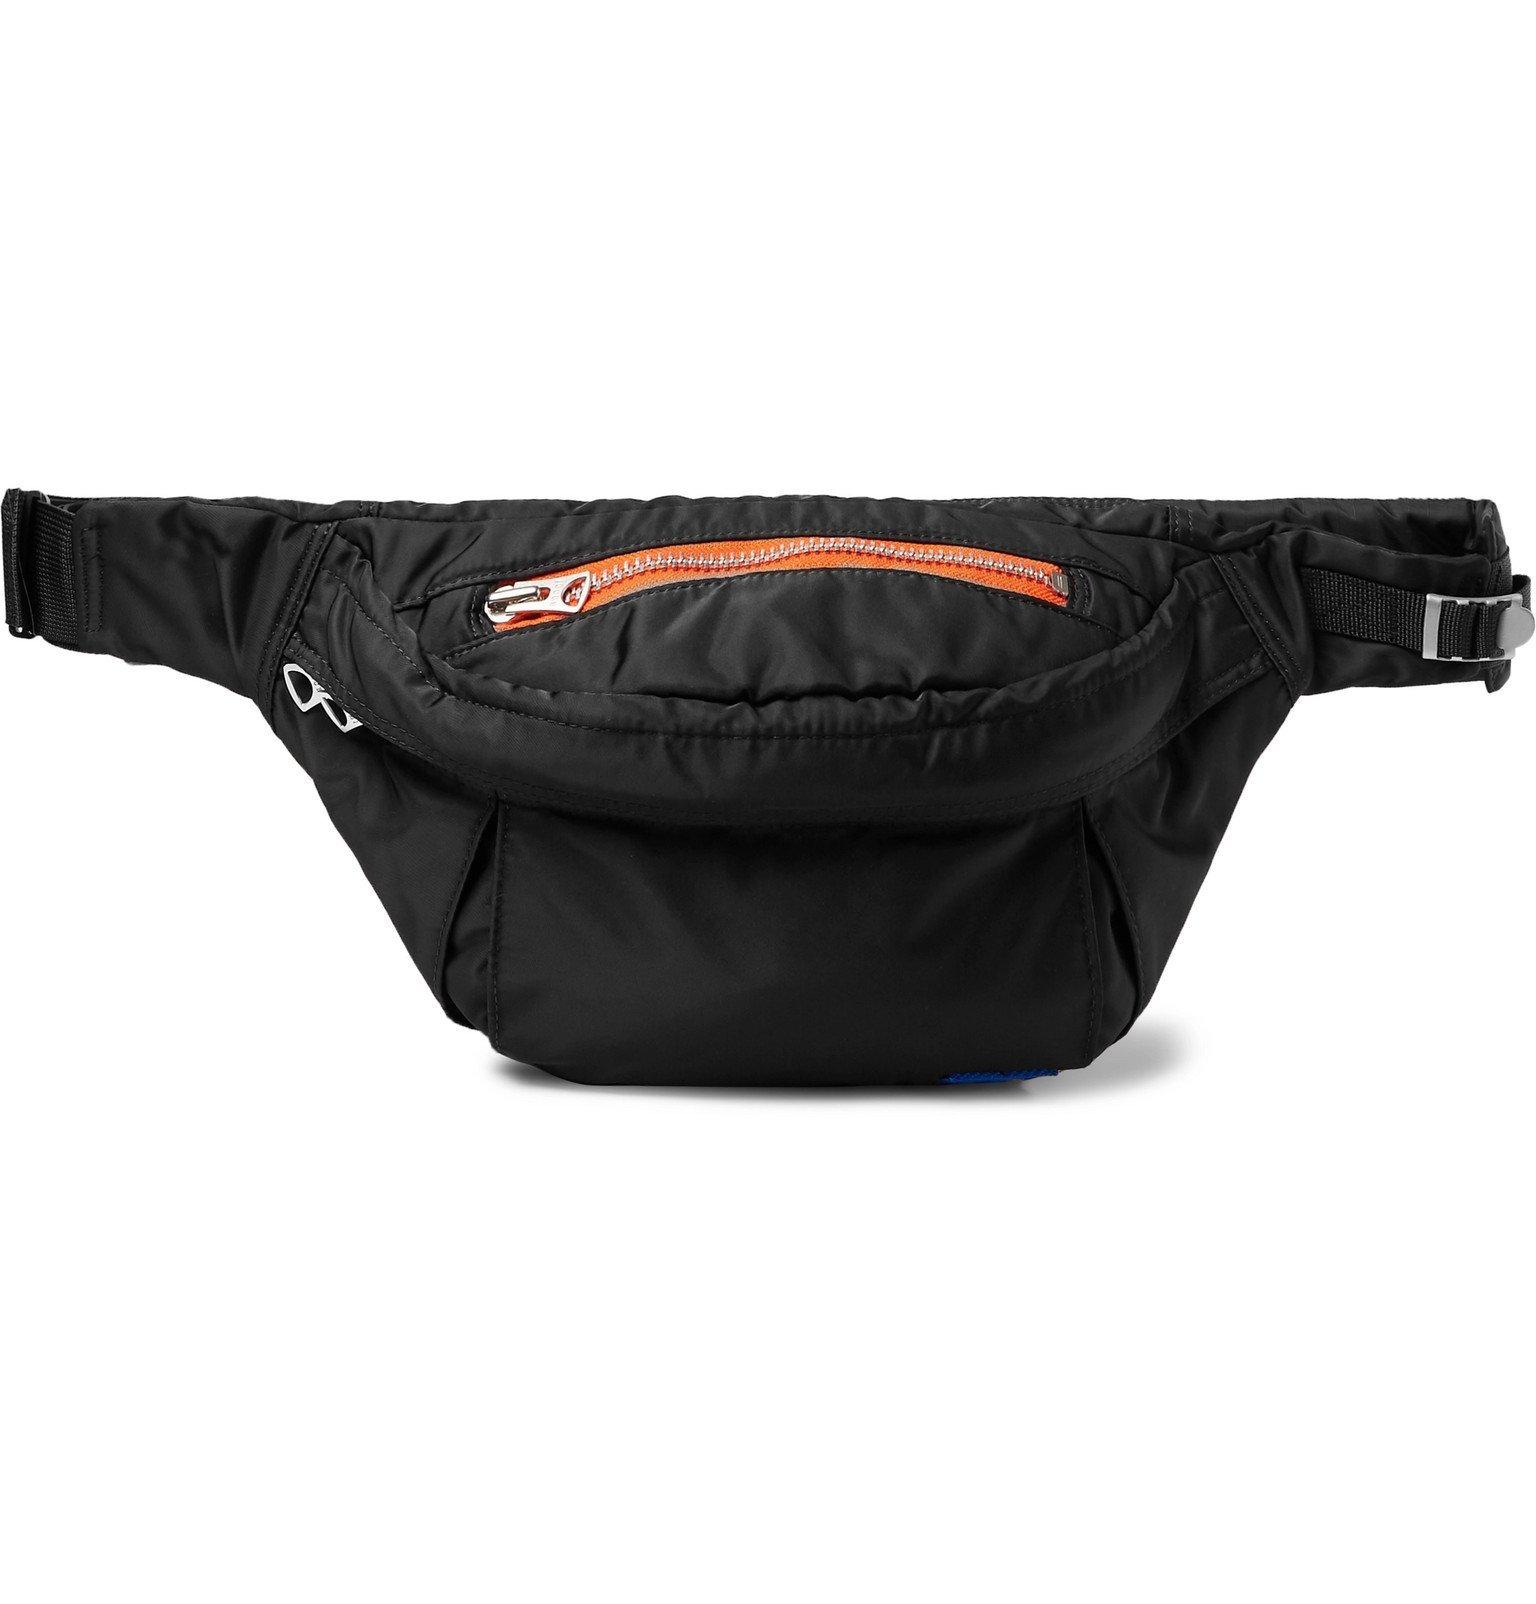 Sacai - Porter Nylon Belt Bag - Black